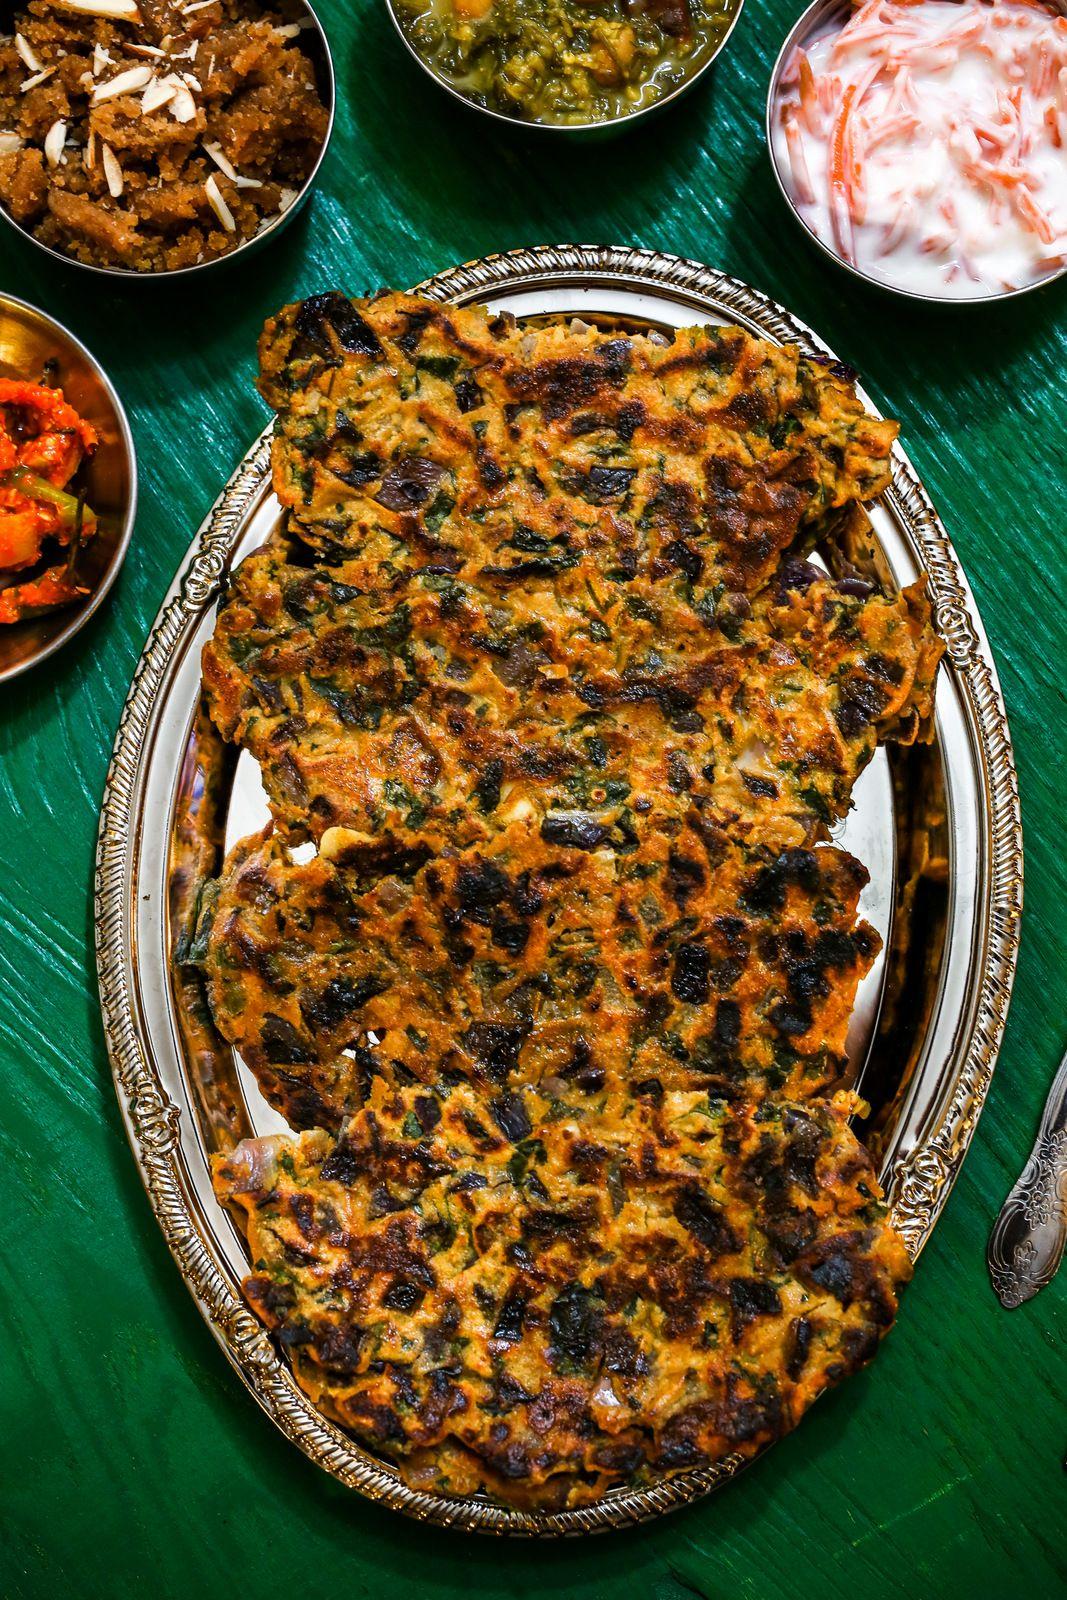 Thalipeeth ghavacha sheera shepuchi bhaji recipe food thalipeeth recipe shepuchi bhaji recipe ghavacha sheera recipe marathi recipes marathi food forumfinder Gallery